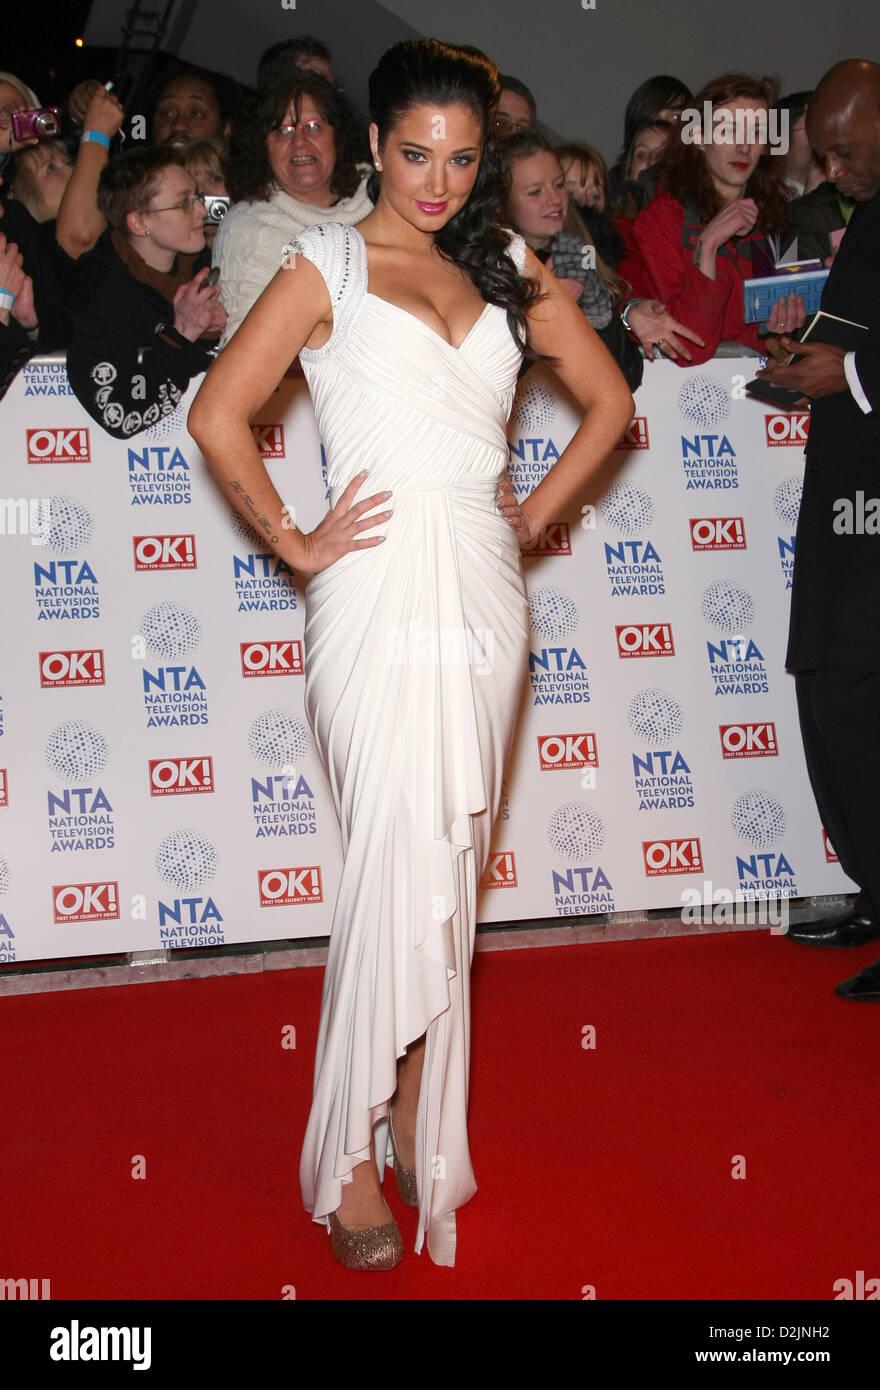 TULISA NATIONAL Television AWARDS RED CARPET Ankünfte LONDON ENGLAND UK 23. Januar 2013 Stockbild